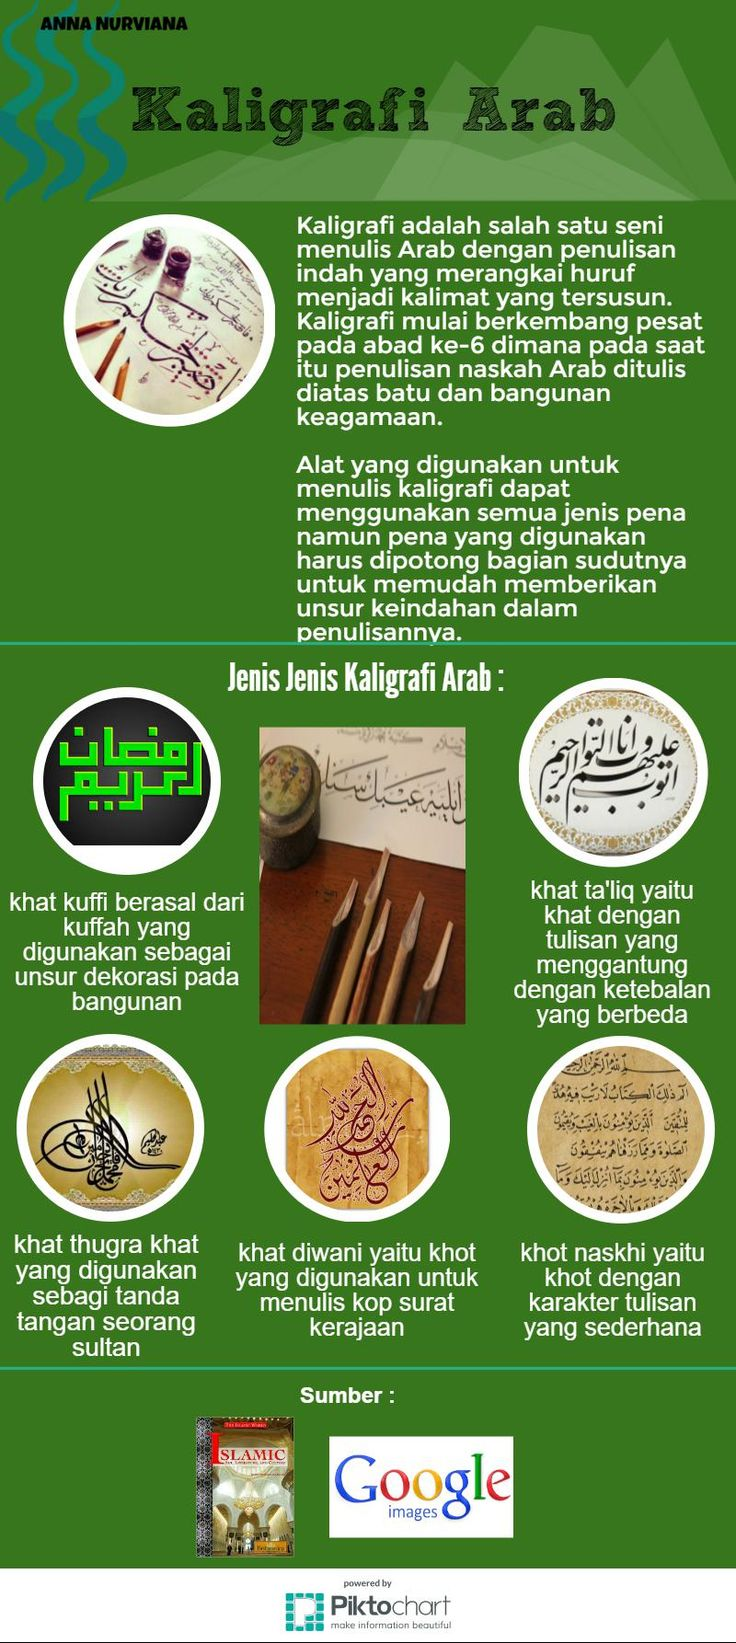 #kaligrafi #arab #kaligrafiarab #islam #caligraphy #islamic #art#pengertian#jenis#kaligrafi#arab